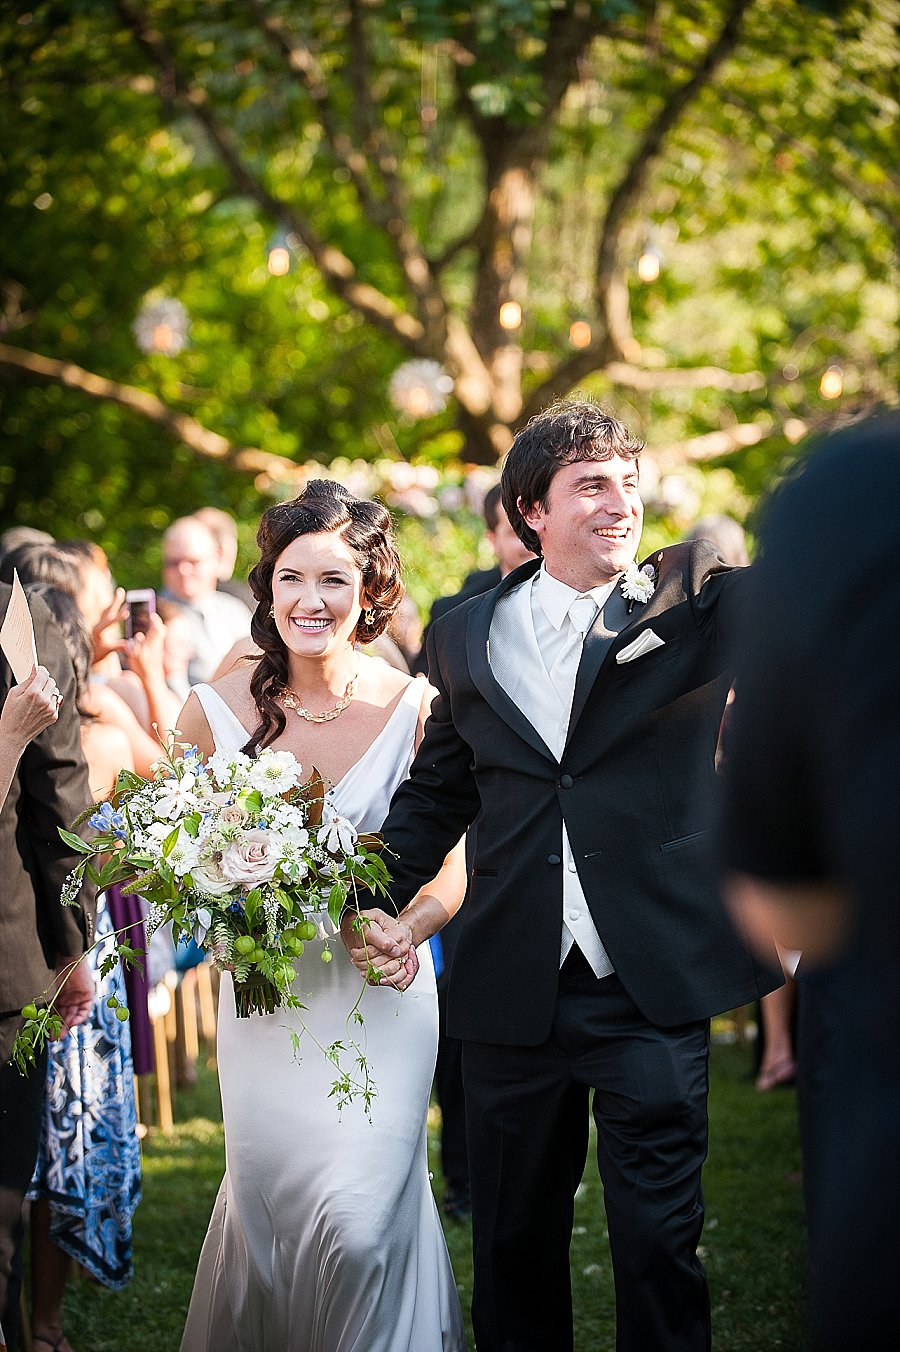 Kafoury Backyard Wedding - Emily Hall Photography-9388.jpg